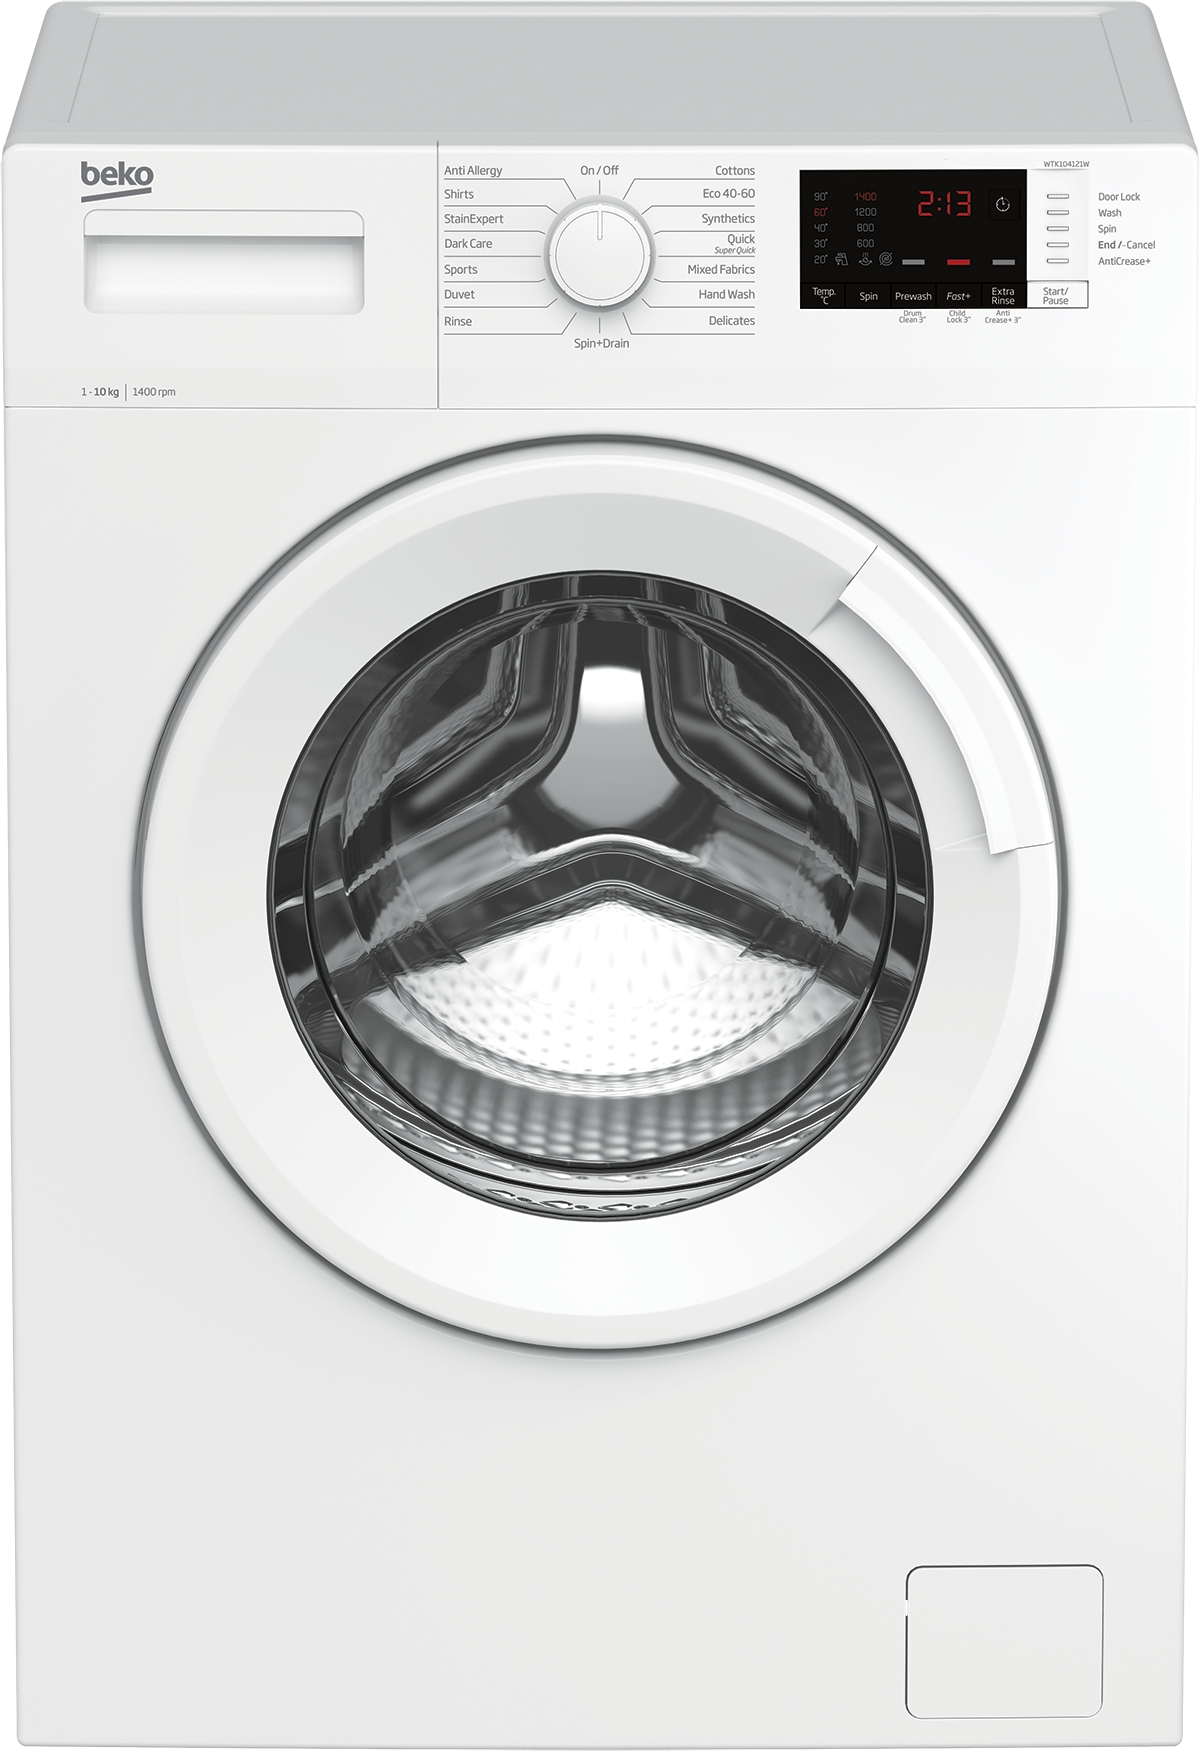 Beko 10KG 1400 spin washer